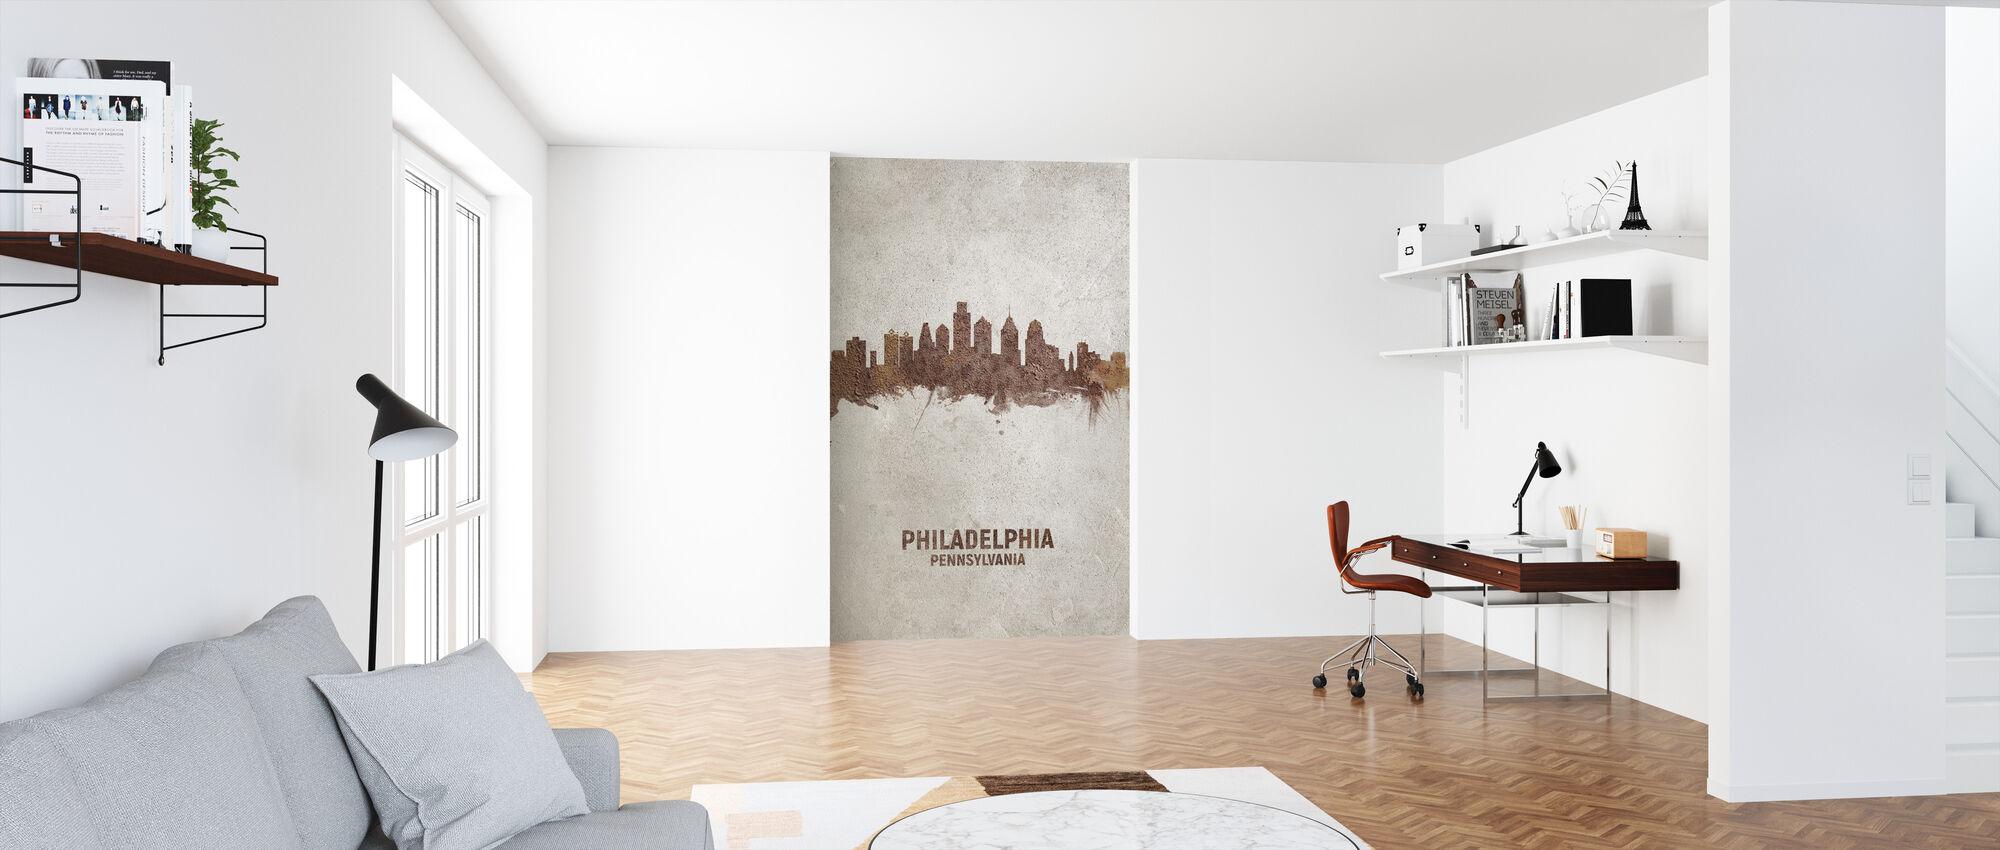 Philadelphia Pennsylvania Rust Skyline - Wallpaper - Office